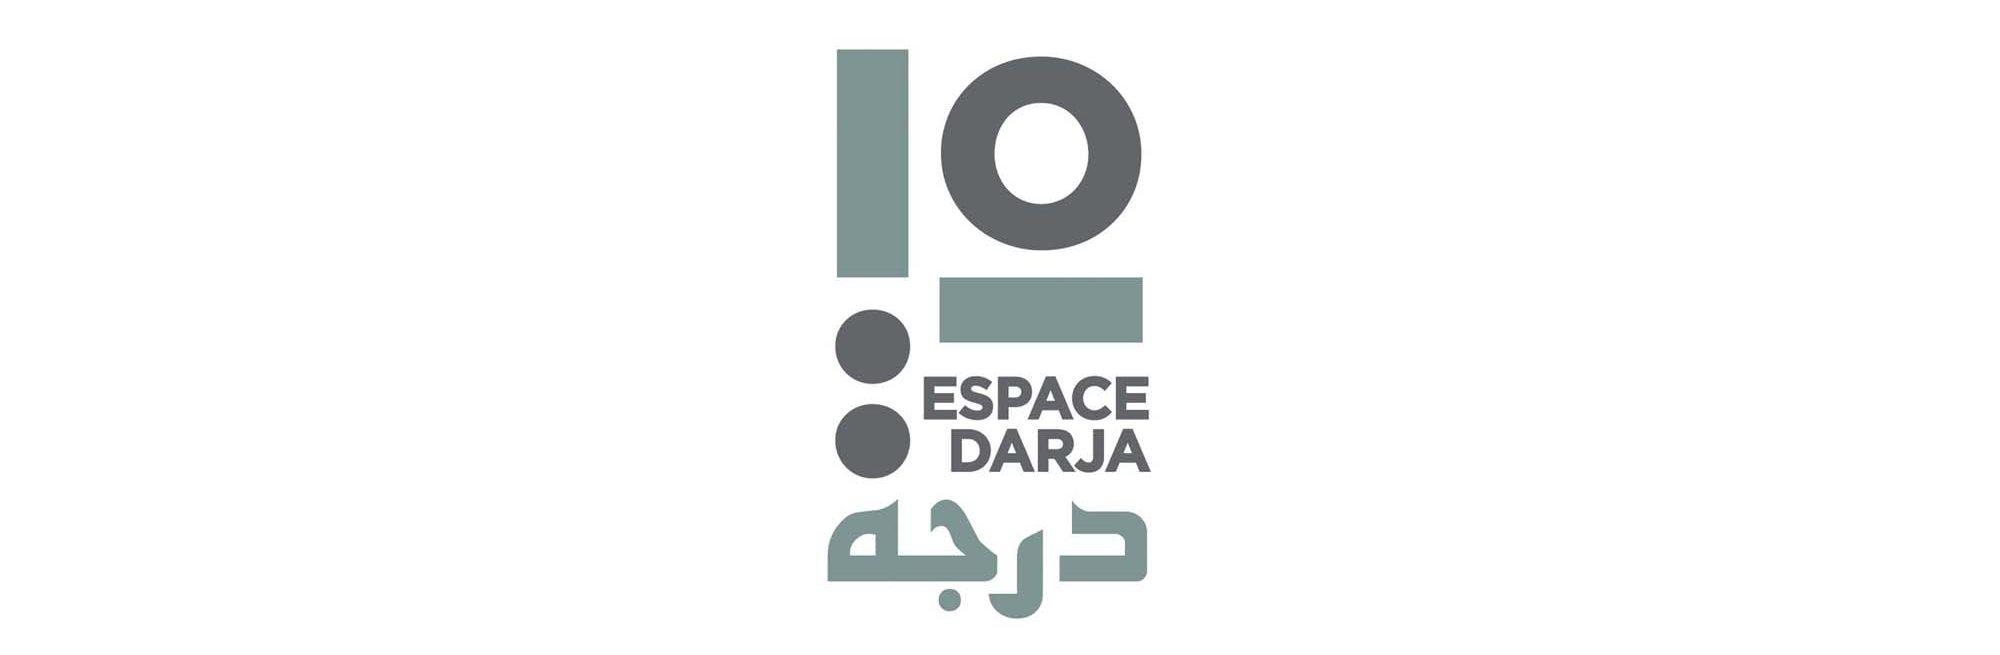 Espace Darja